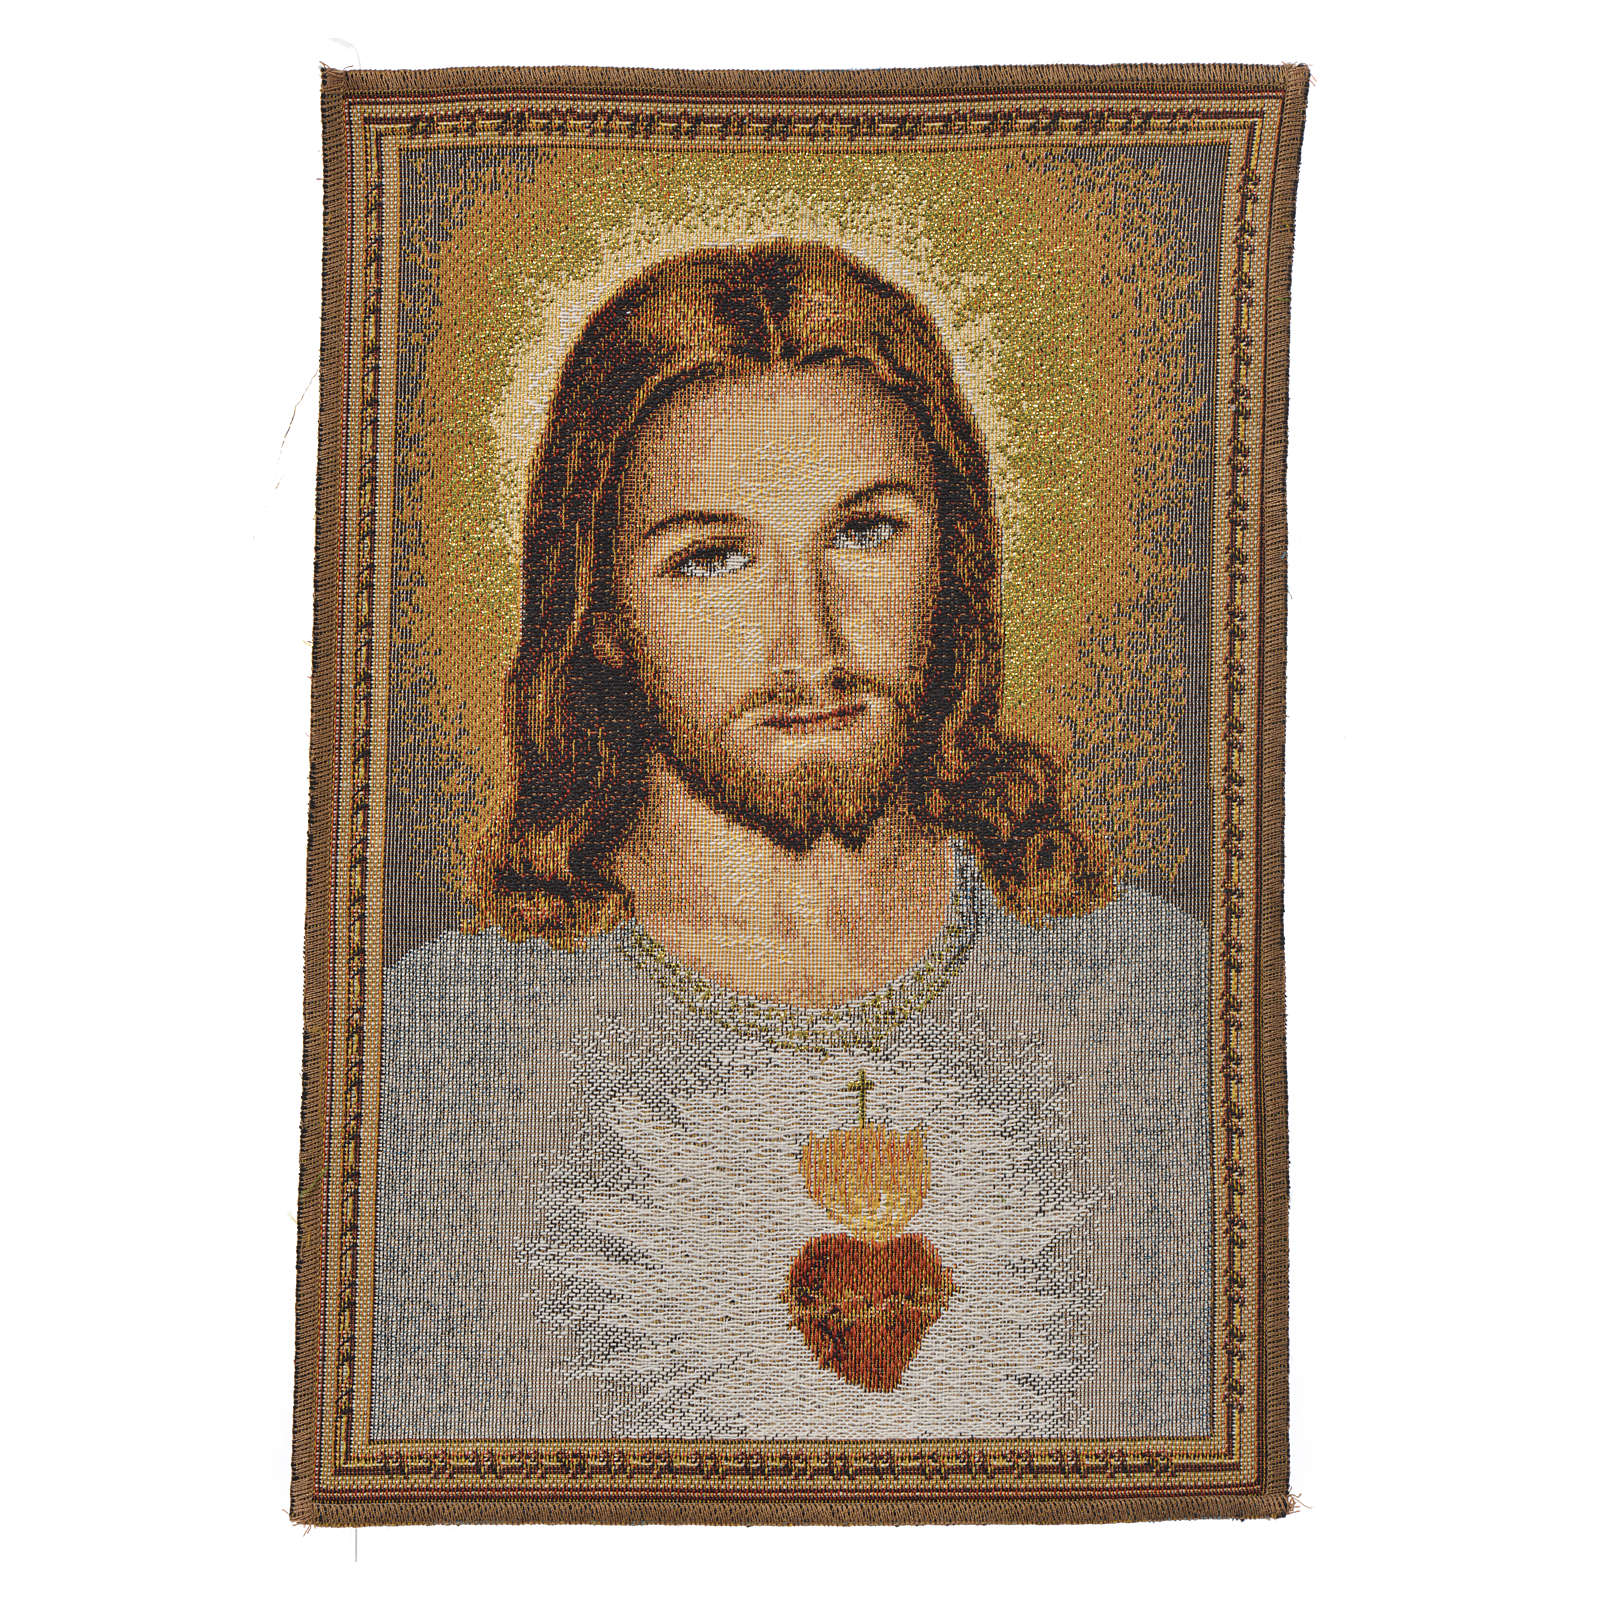 Gobelin Najświętsze Serce Jezusa 32x23 cm 3